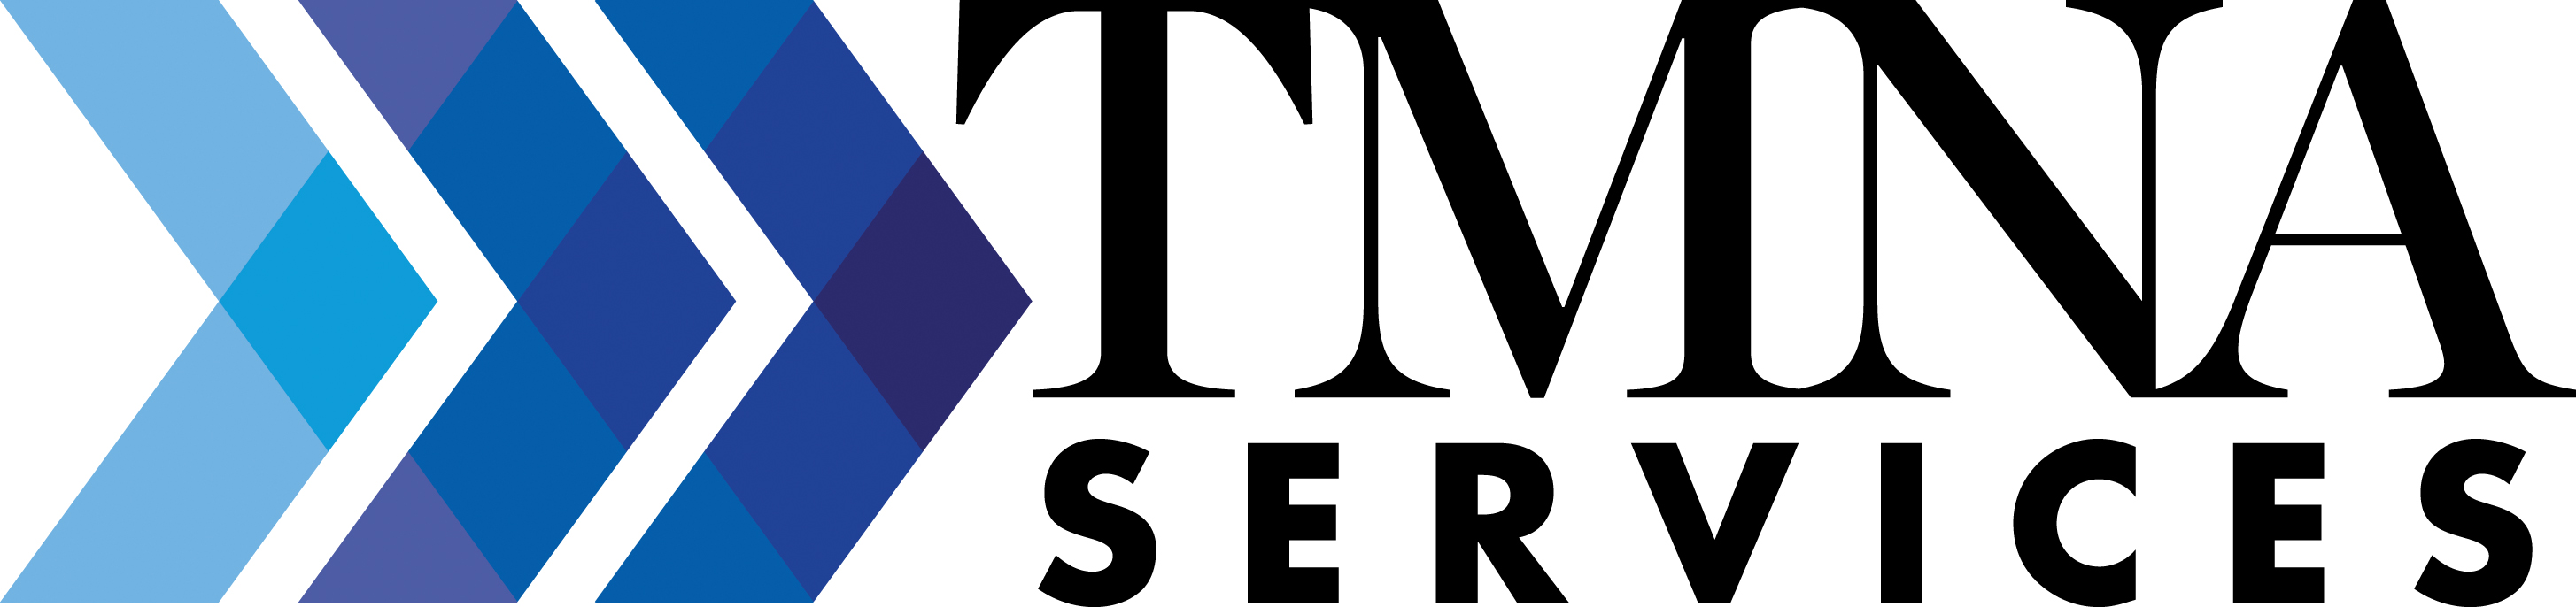 TMNA Services Logo